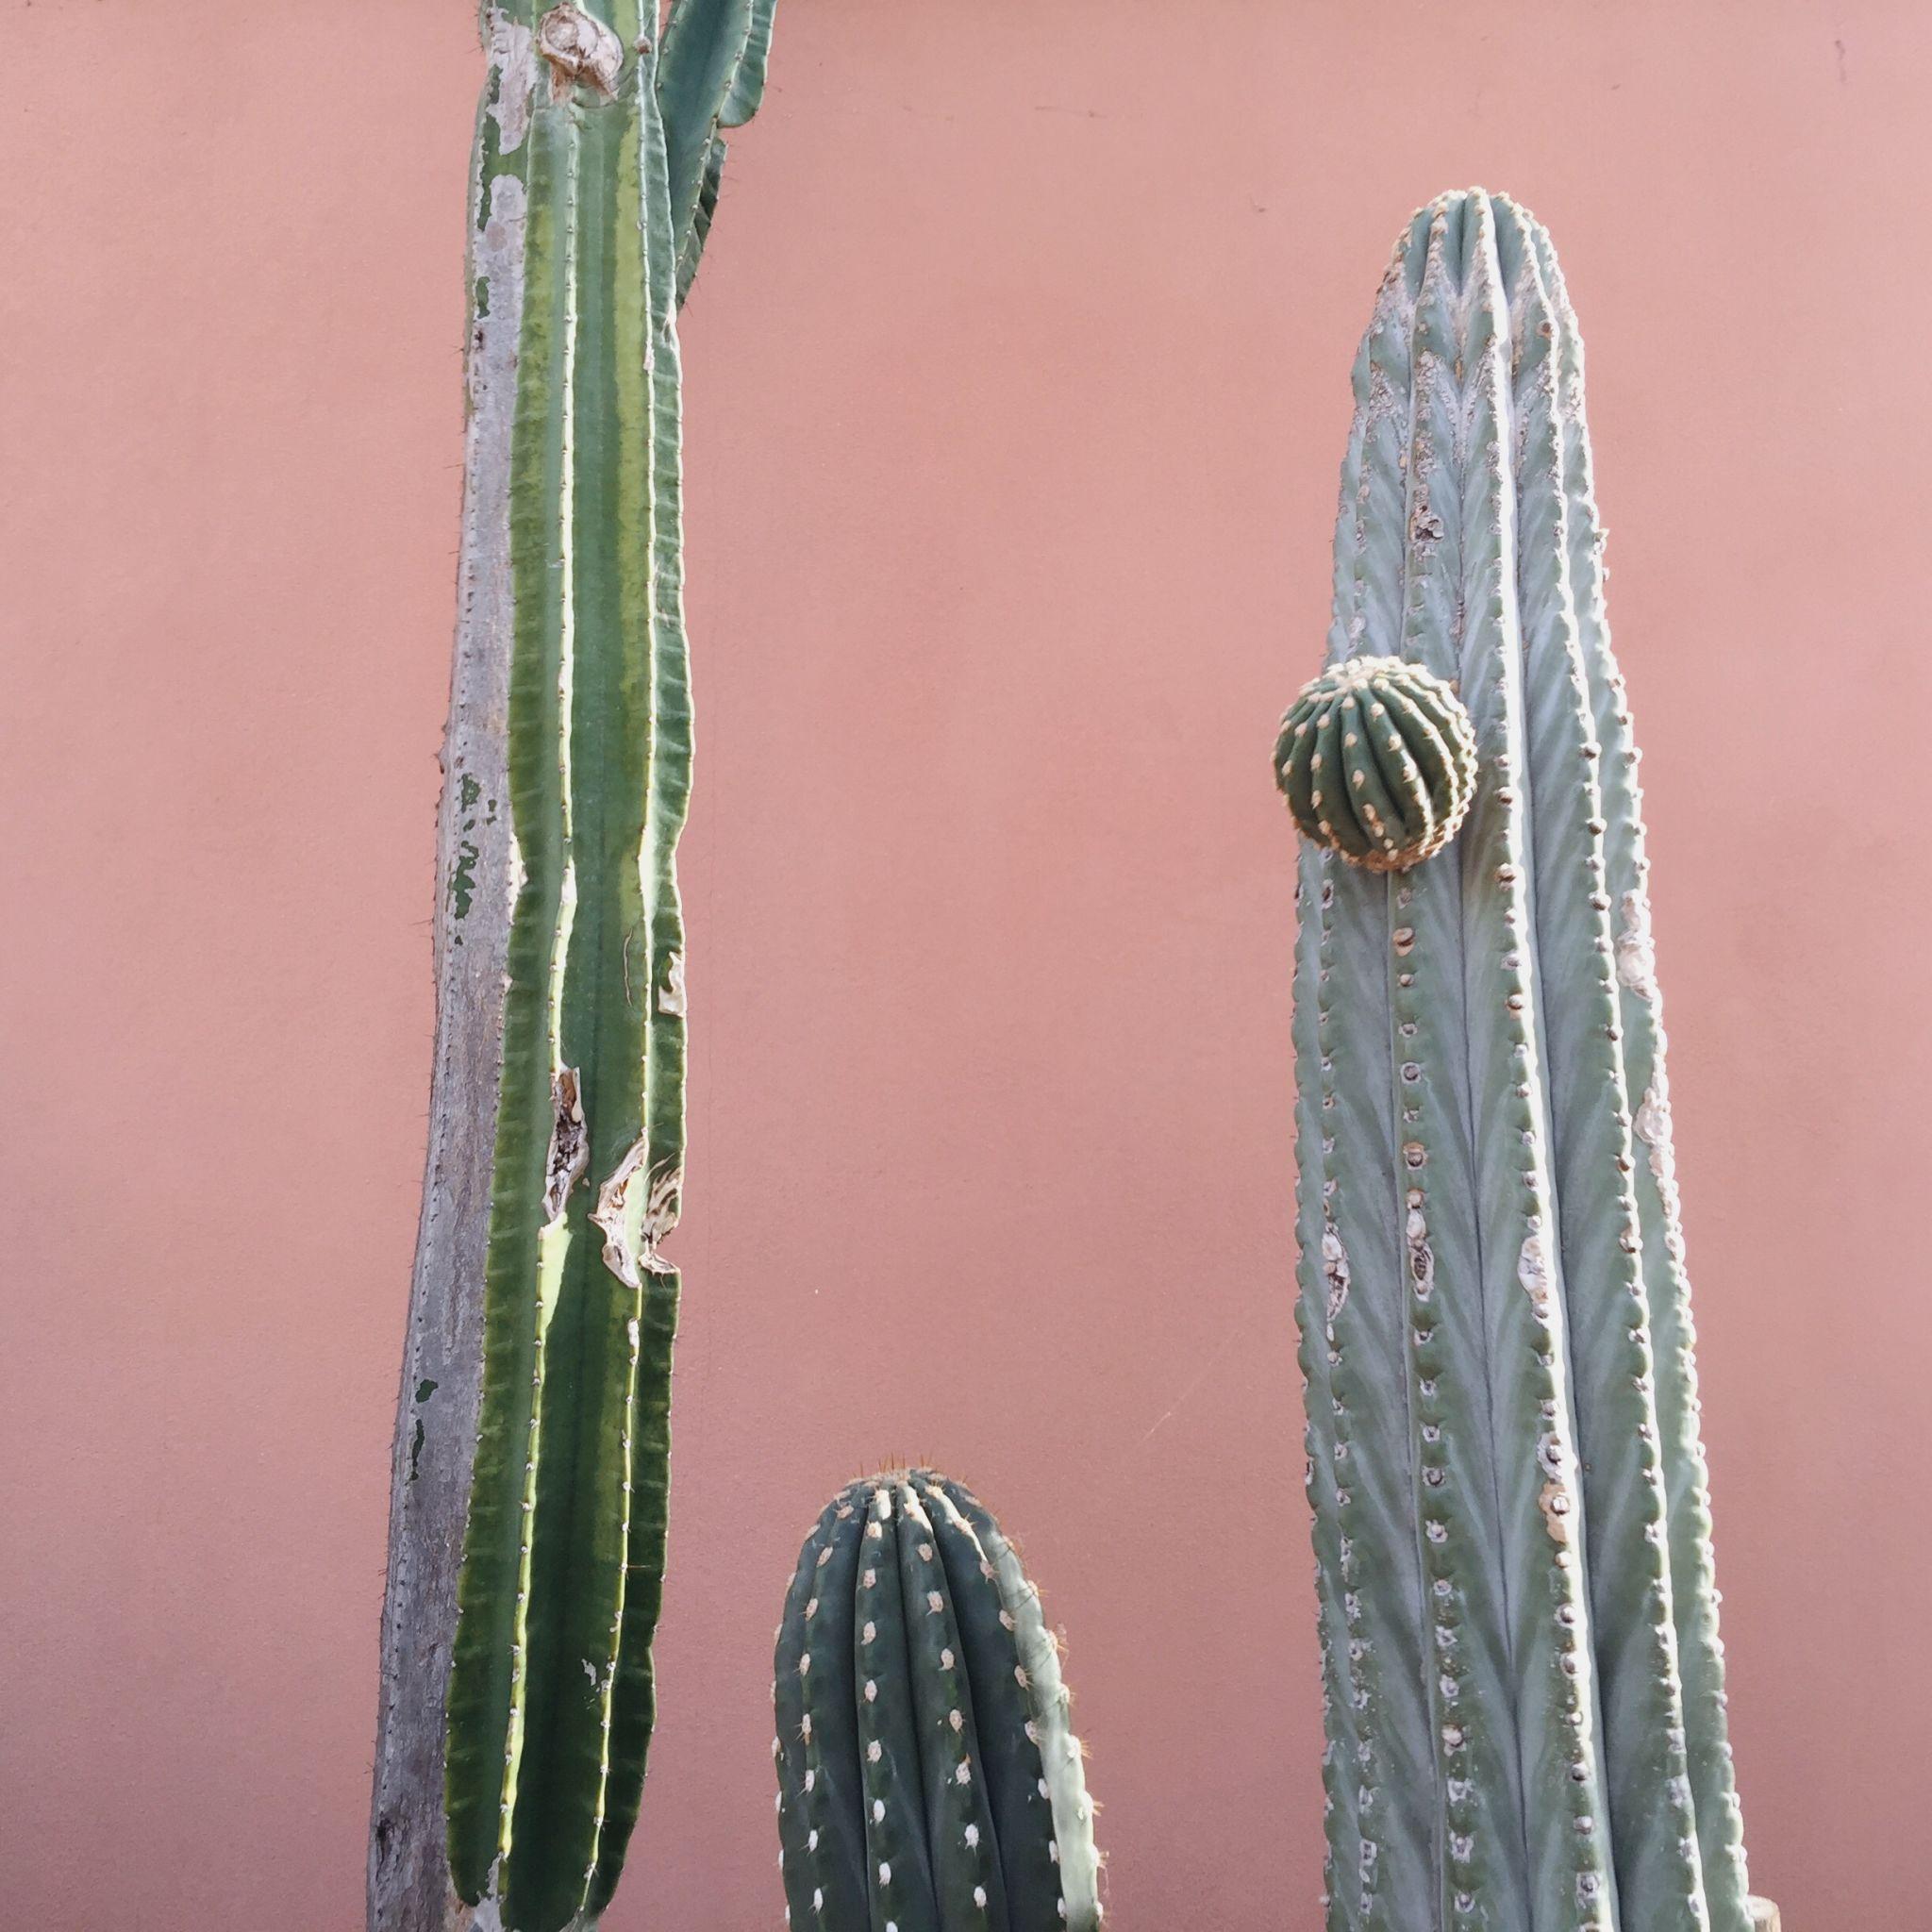 hortus-botanicus-amsterdam-botanic-garden-cactus